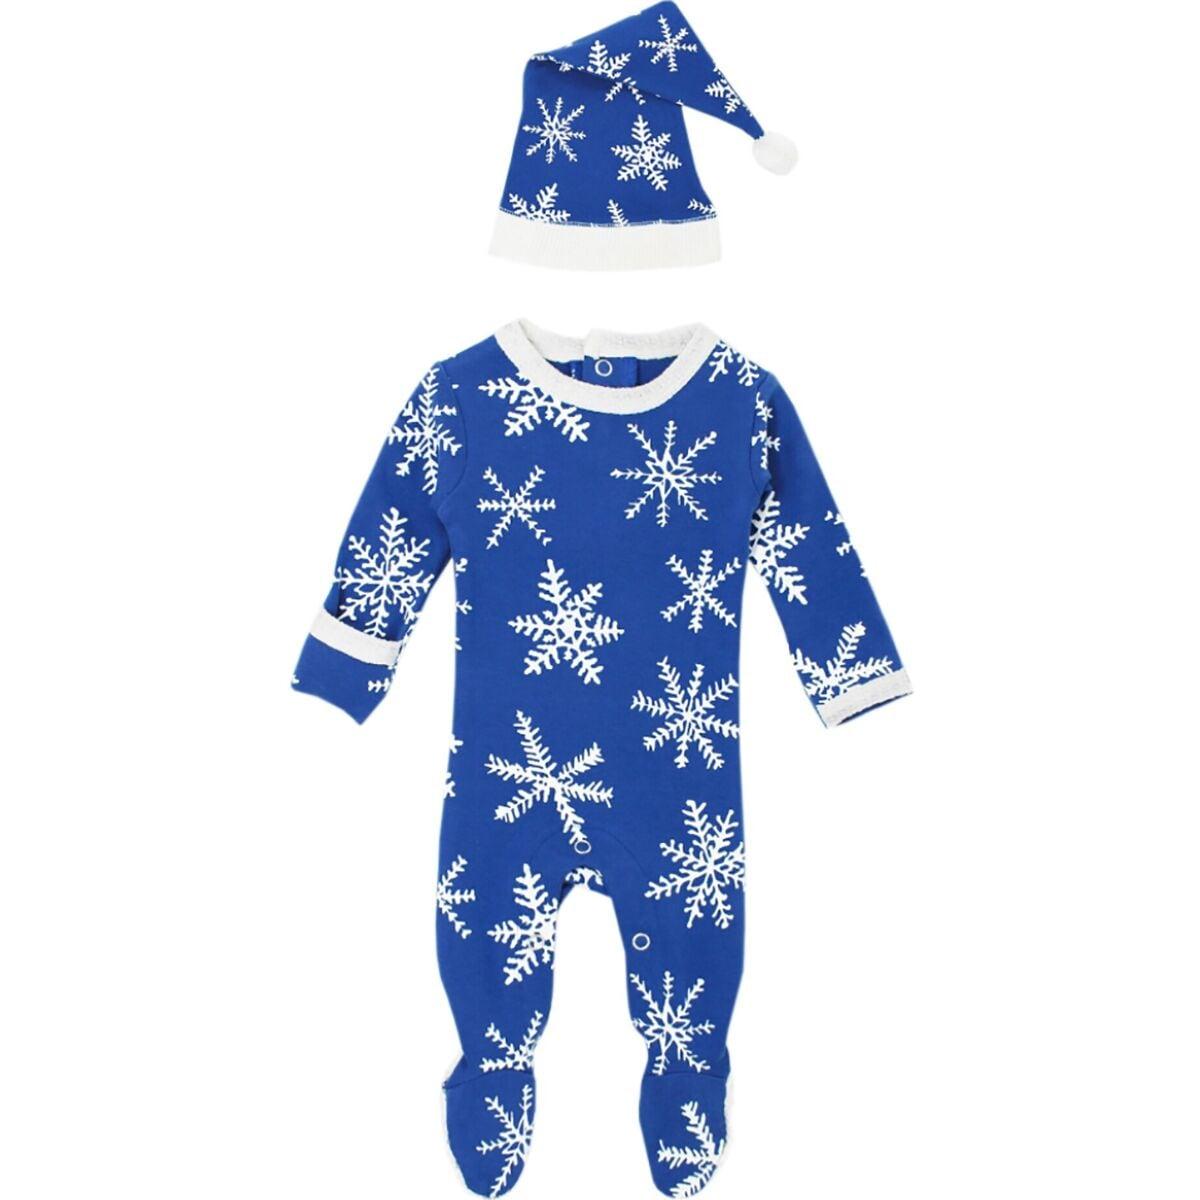 Lovedbaby Organic Infant Cap